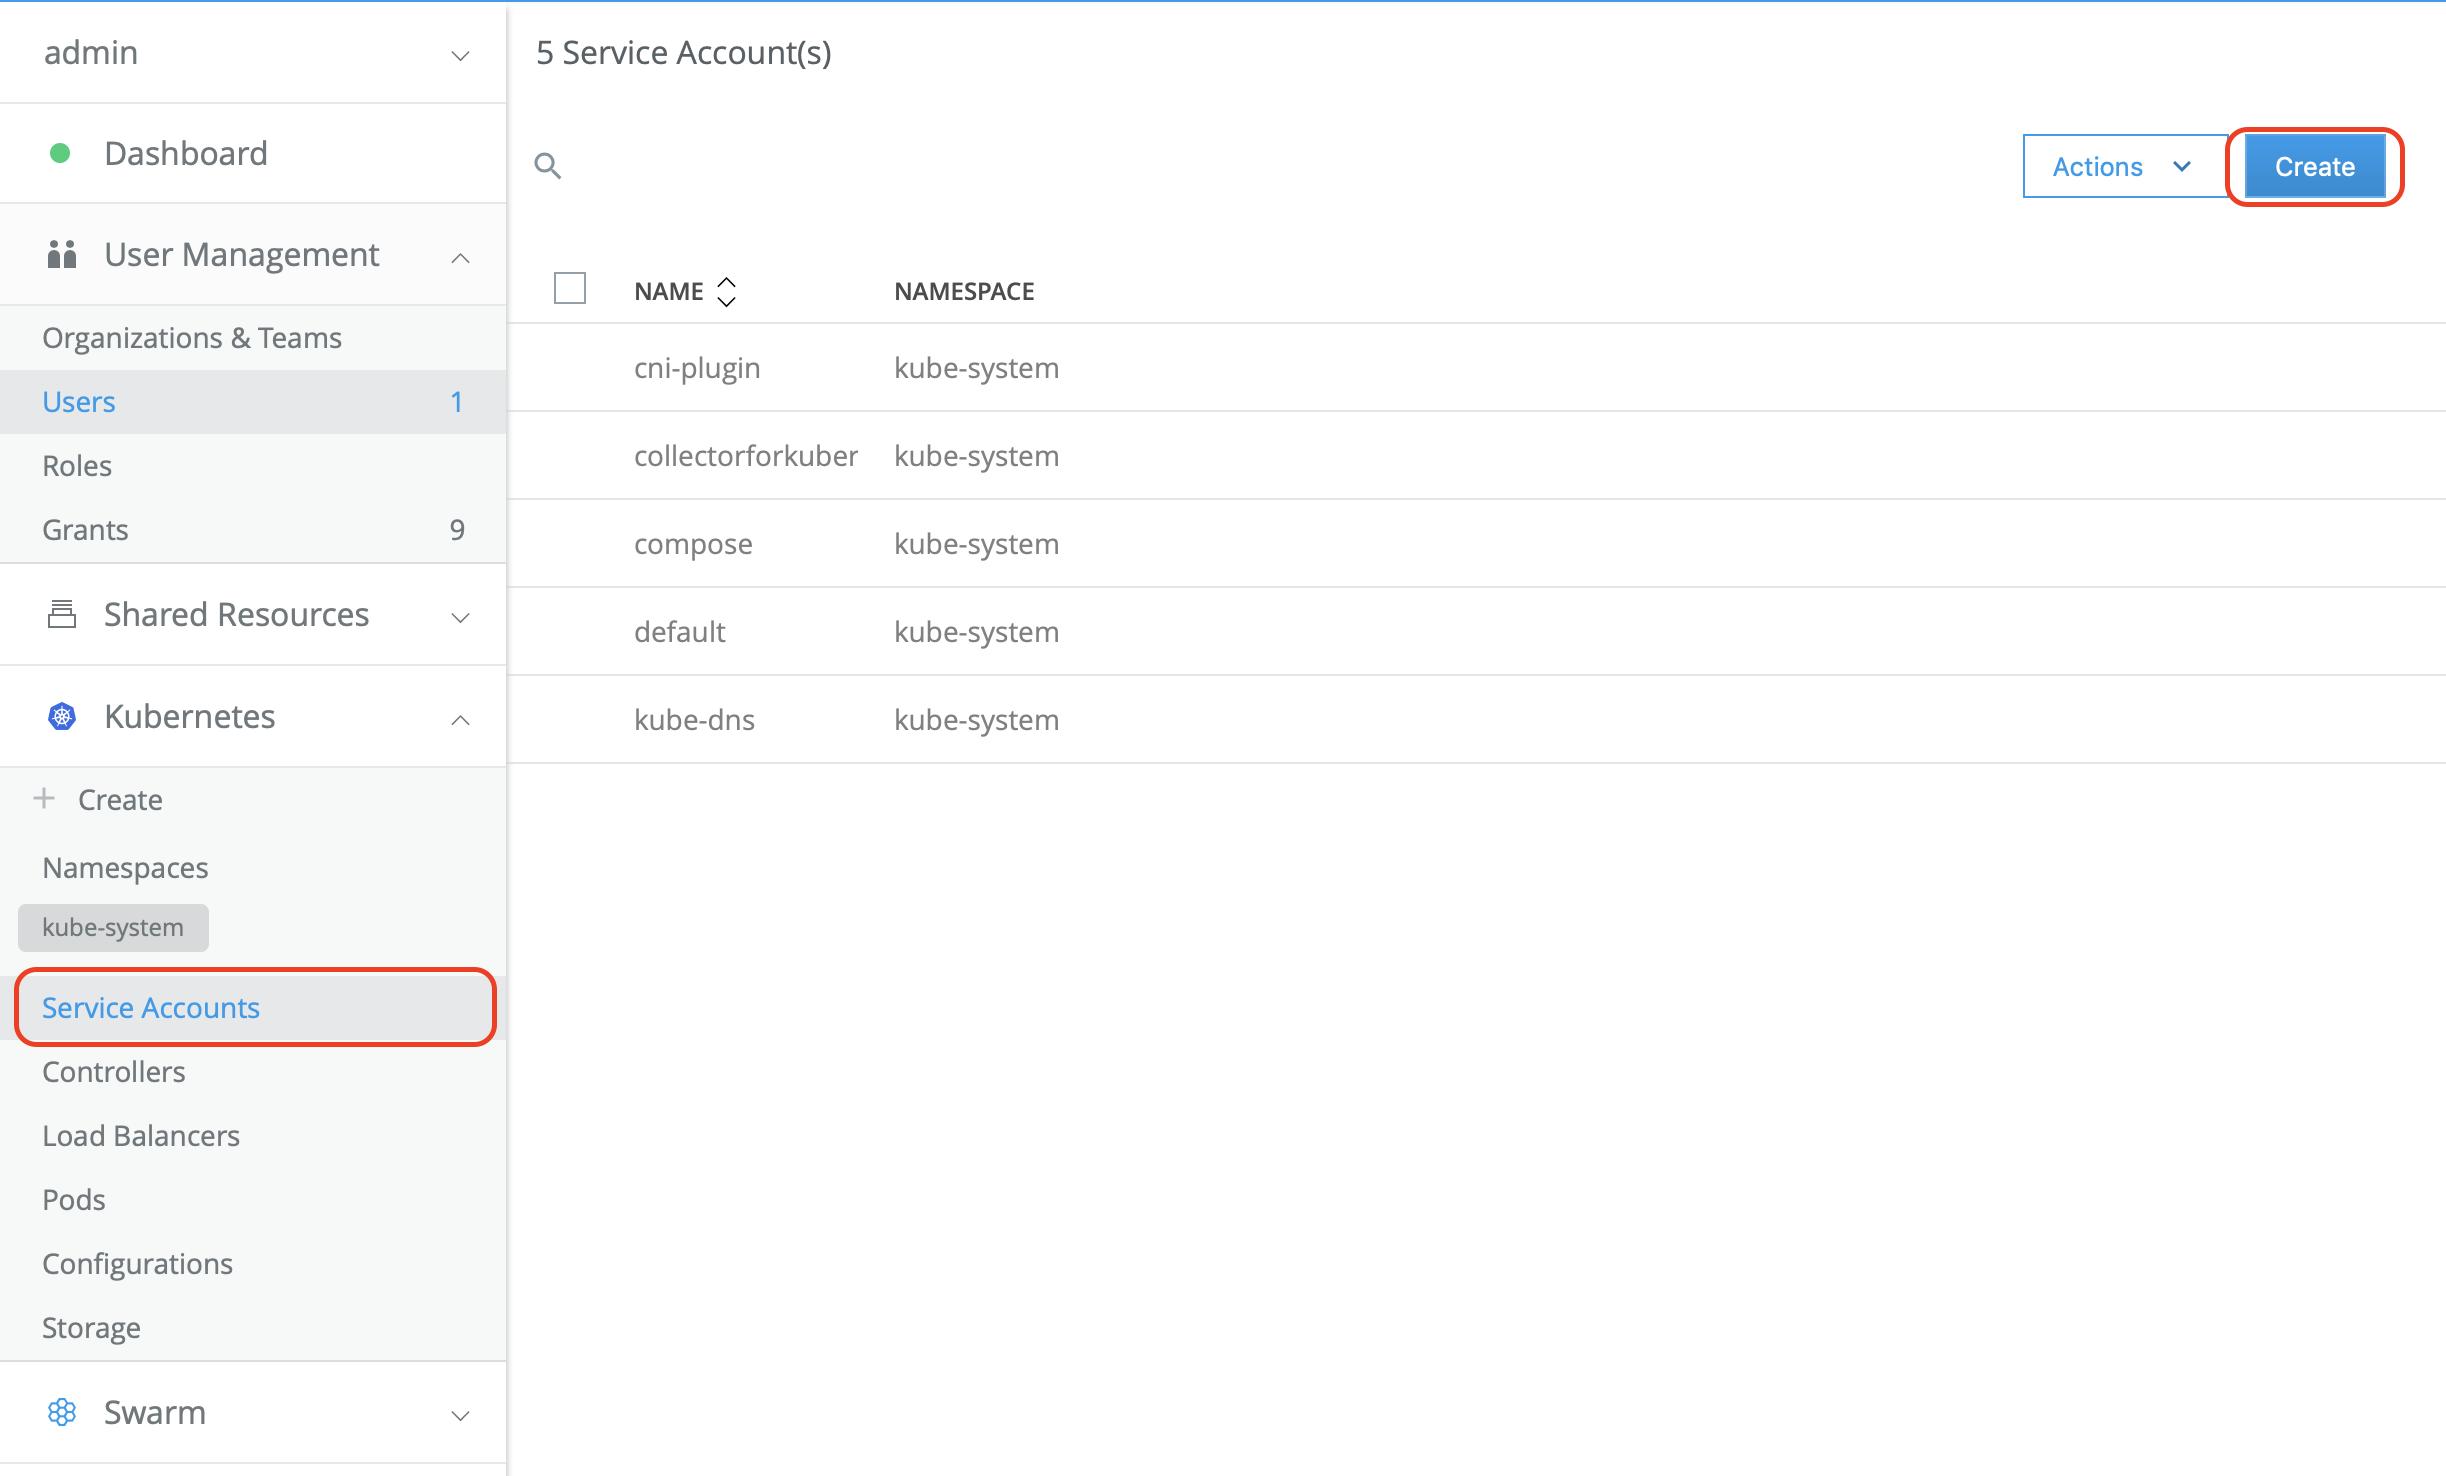 Monitoring Docker Universal Control Plane (UCP) with Splunk